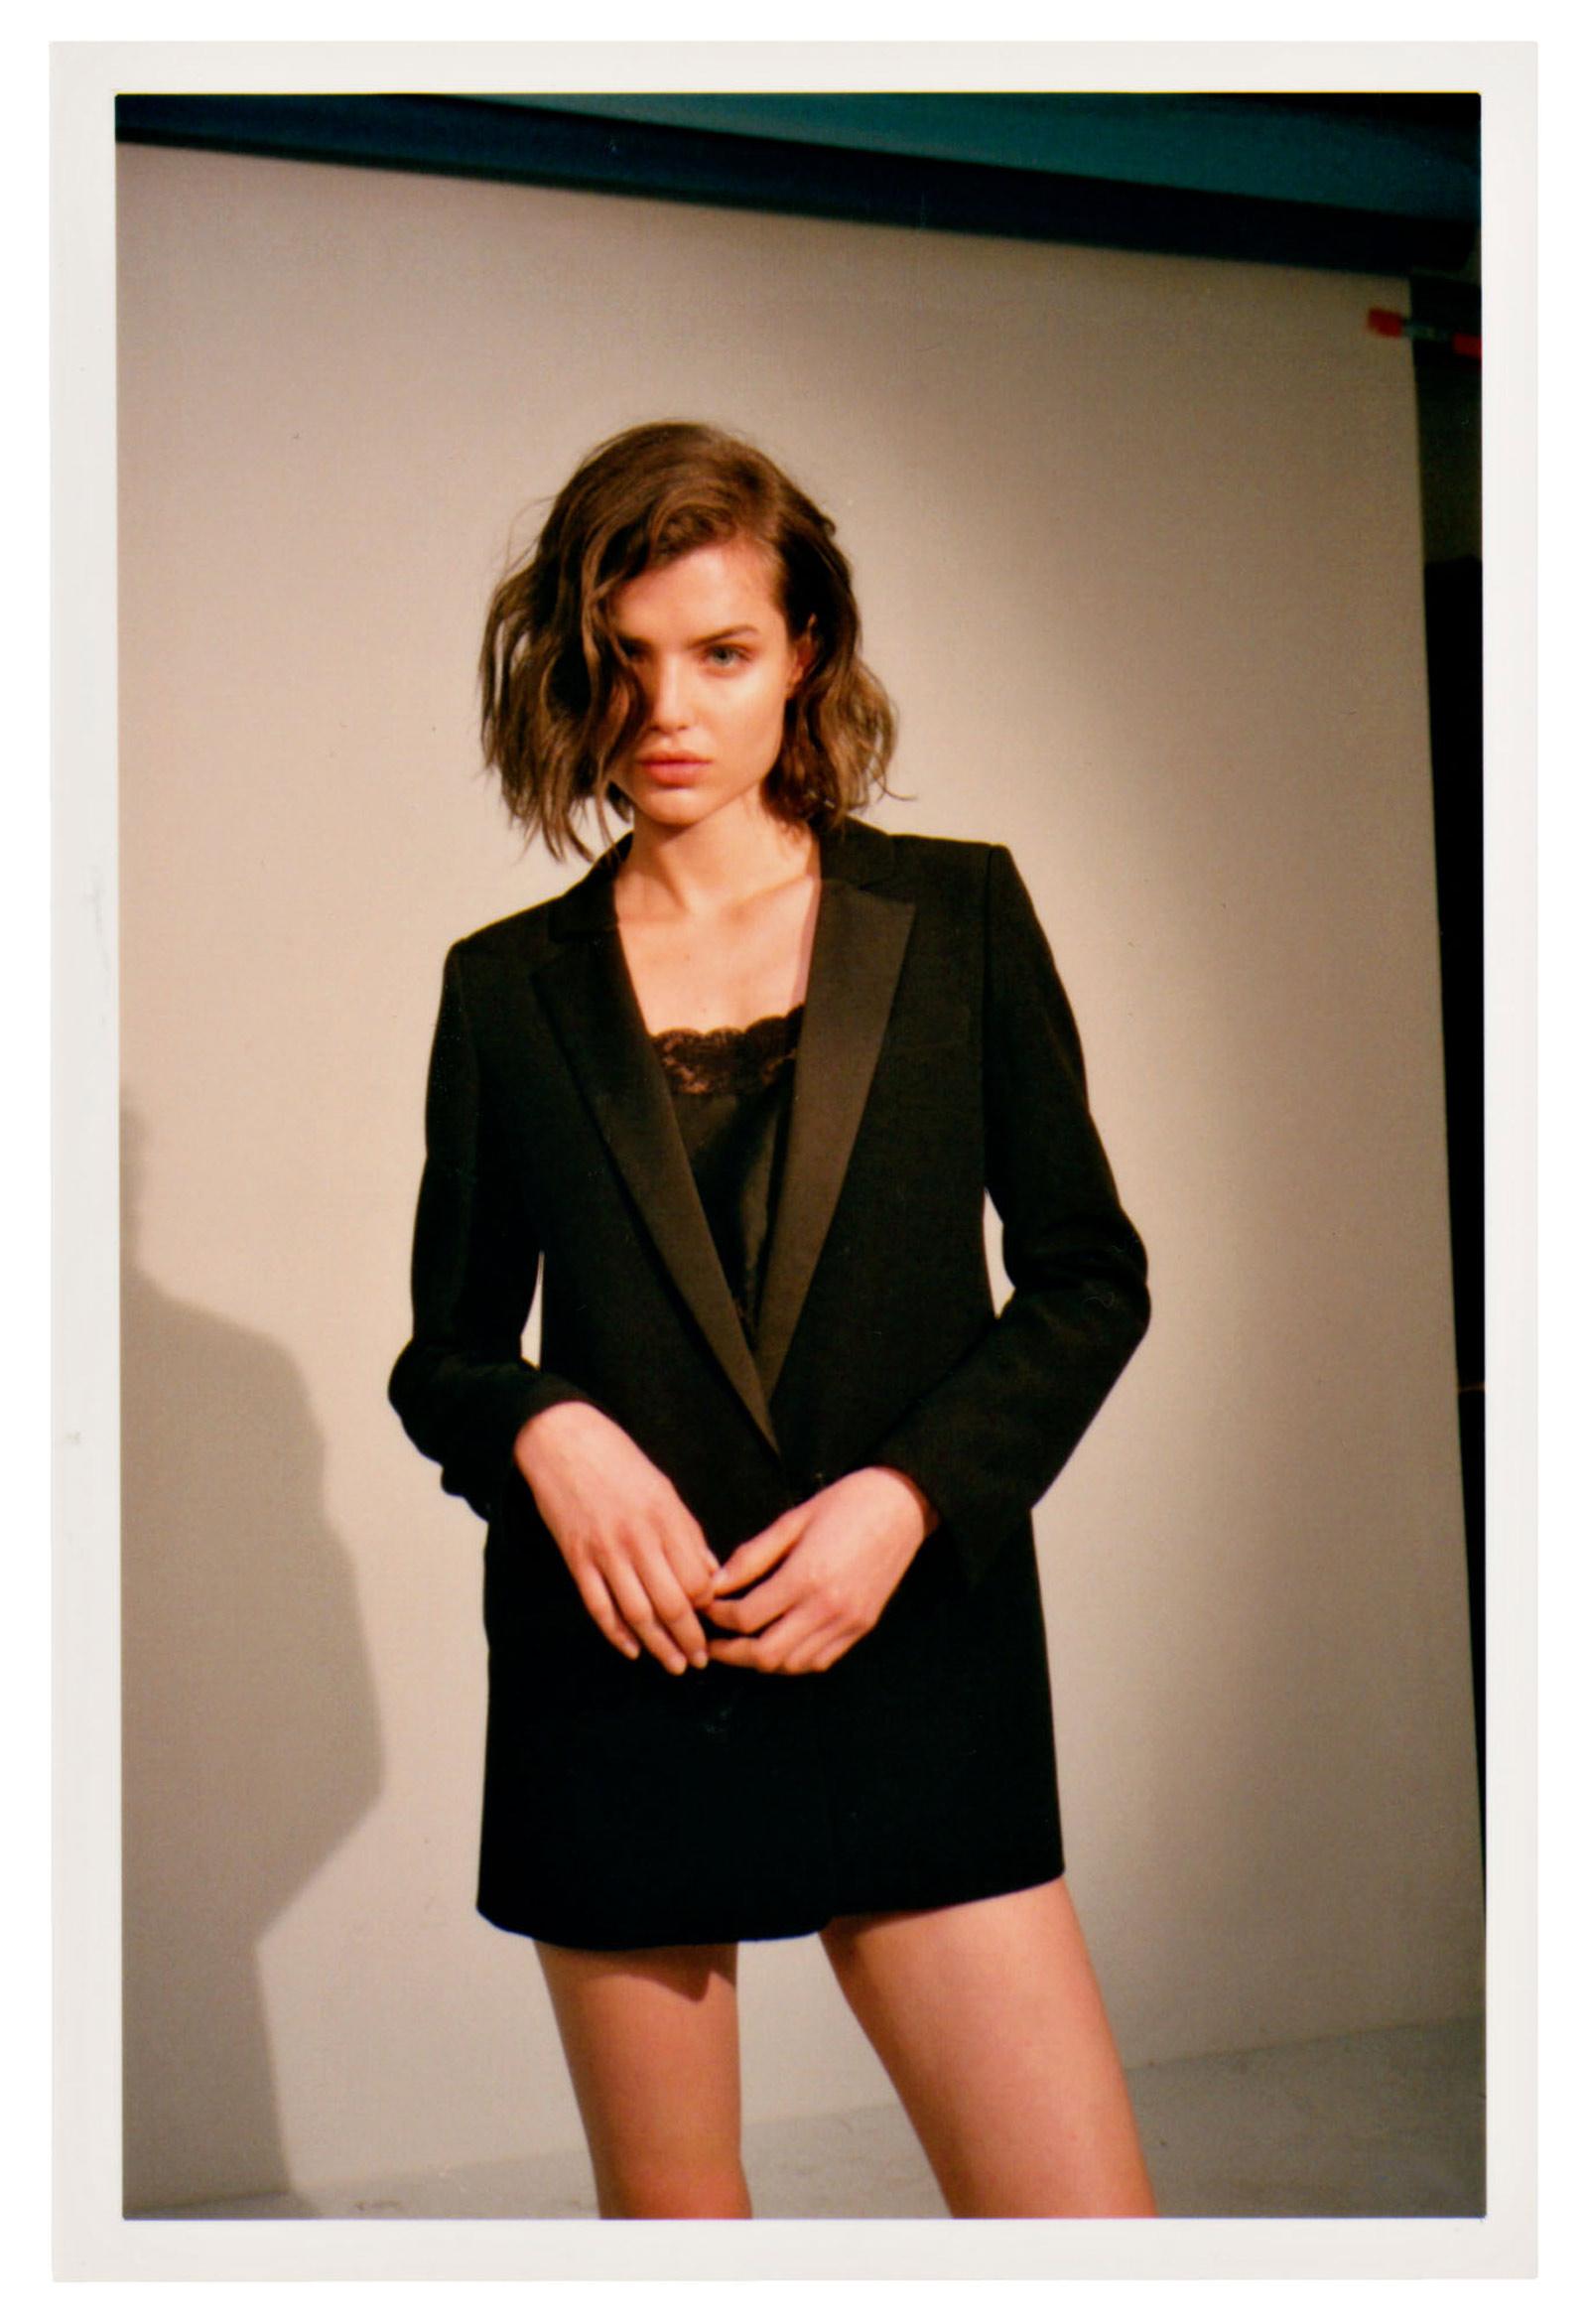 Emilia_Vuciniv_Models_dot_6_web-1600_20.jpg